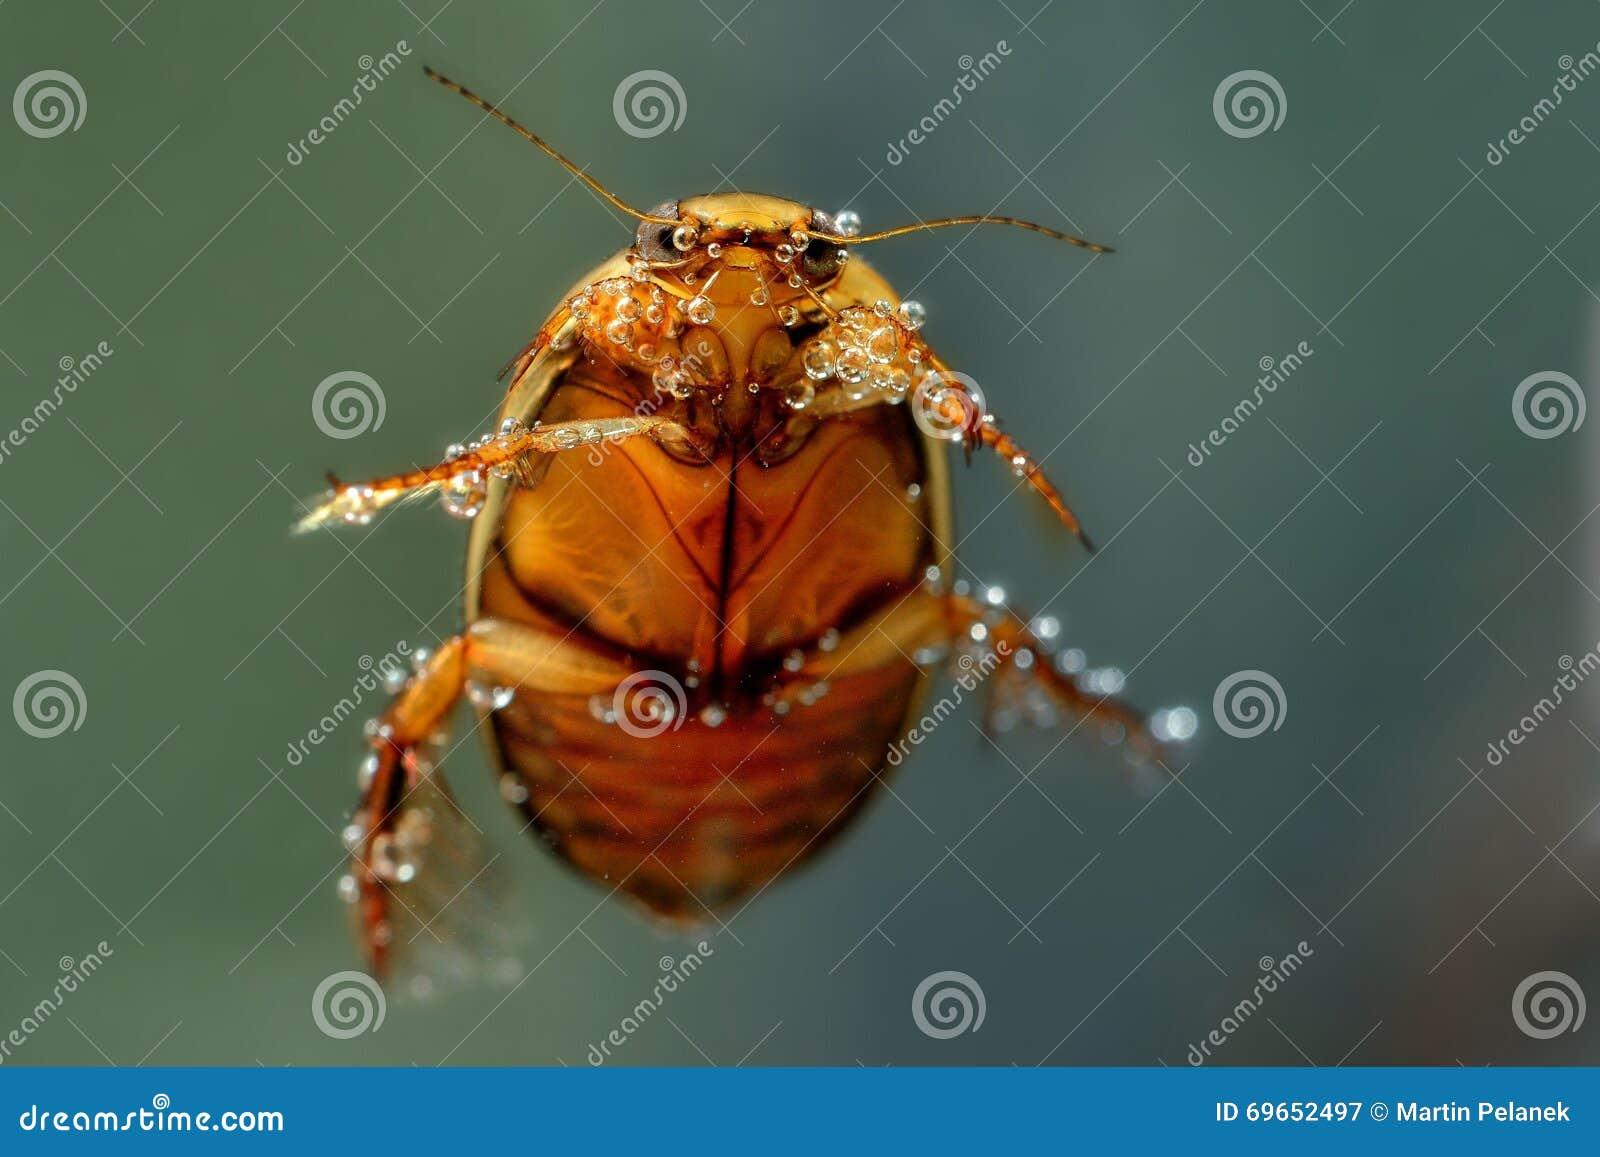 diving beetle graphoderus cinereus stock image image of detail